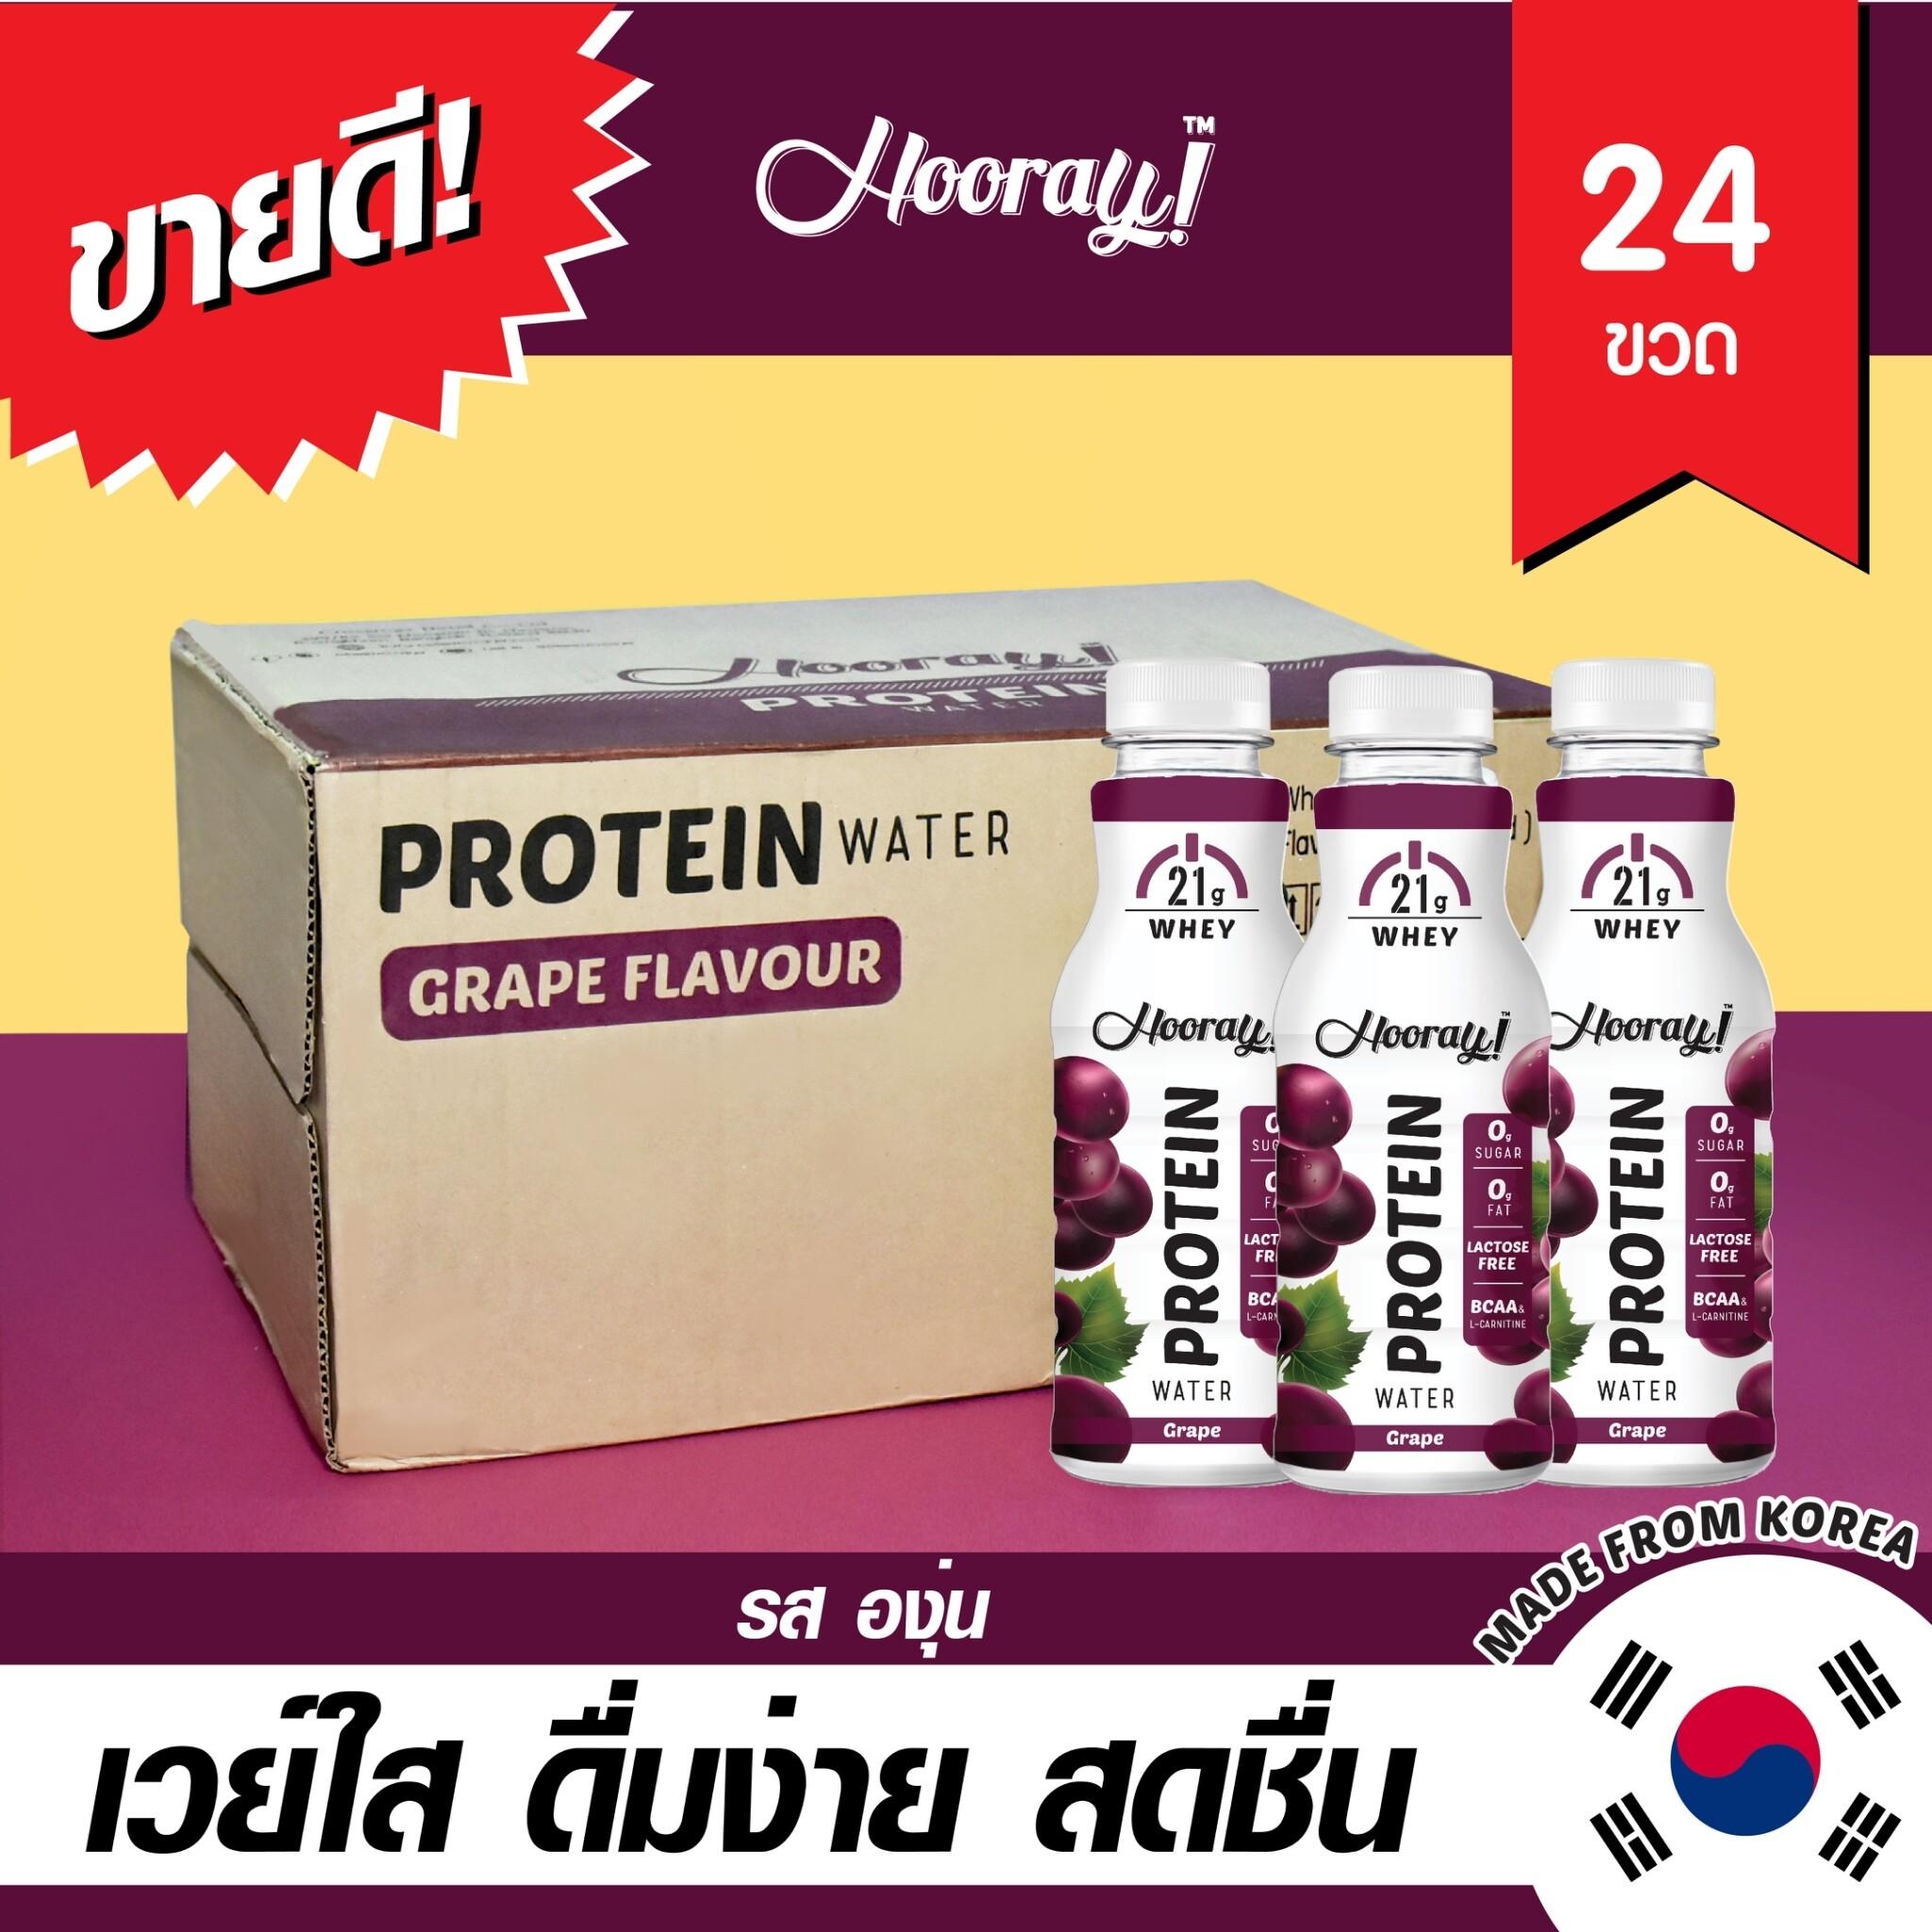 Hooray! Whey Protein Isolate เวย์โปรตีน เวย์ใส พร้อมดื่ม ไม่ต้องชง นำเข้าจากเกาหลี กลิ่นองุ่น 24 ขวด